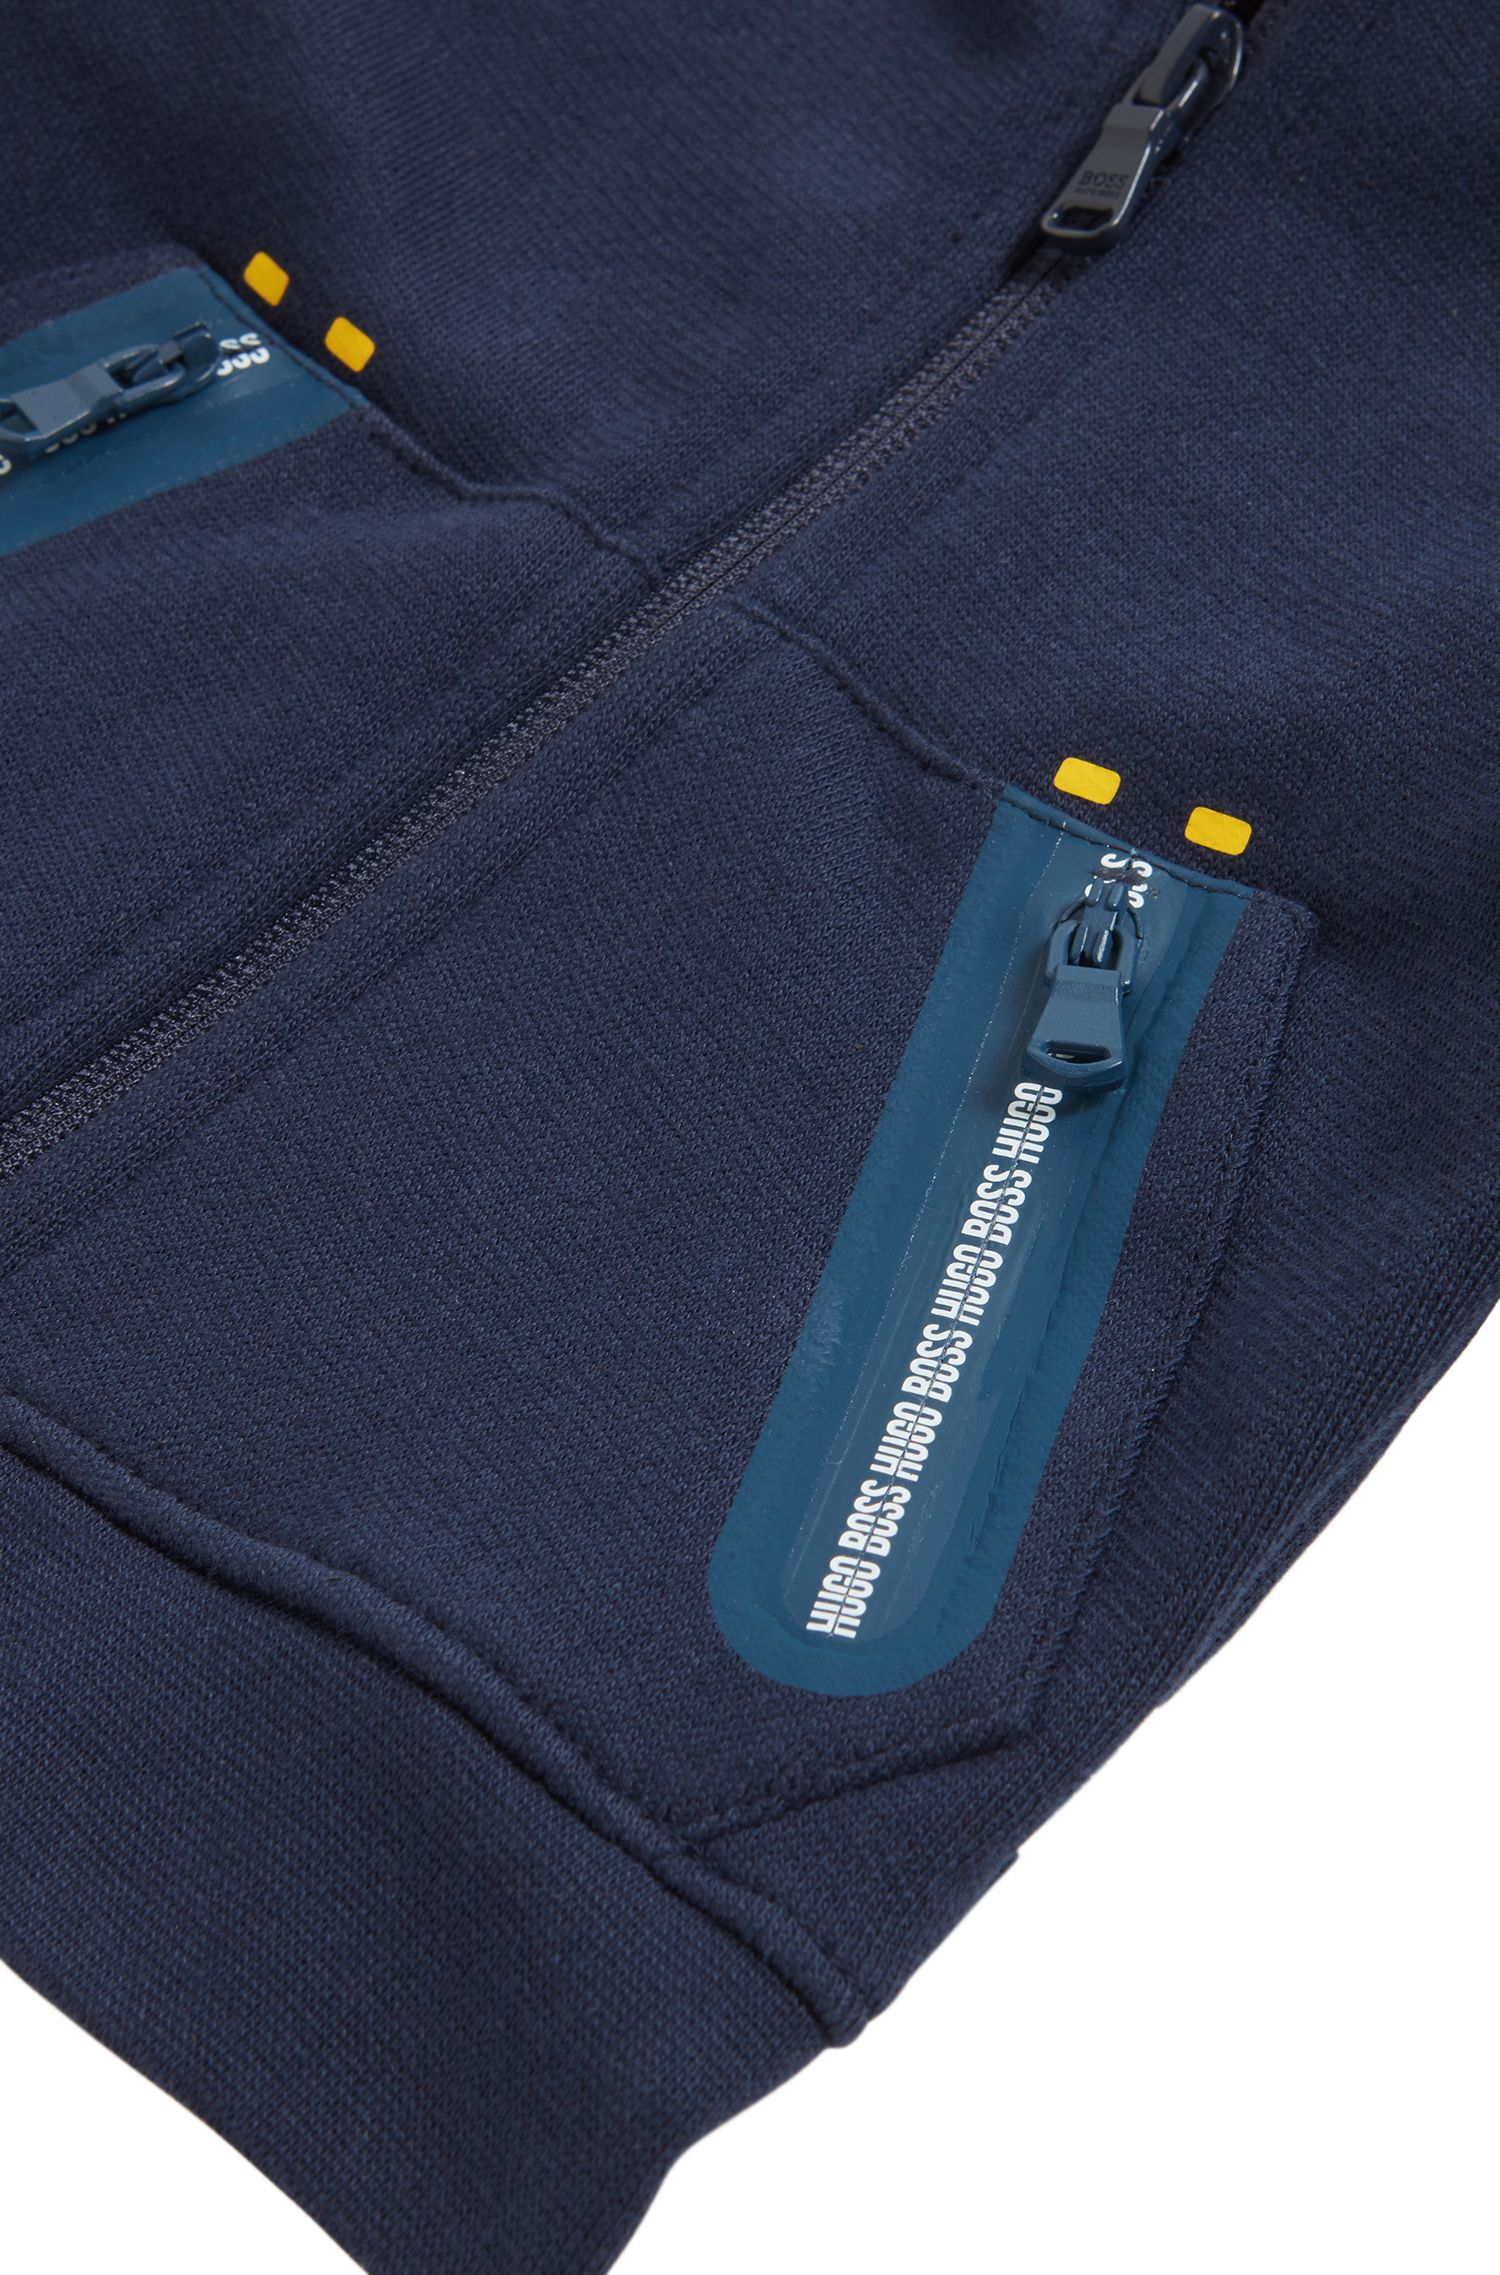 Kids-Kapuzenjacke aus Baumwoll-Fleece mit transparentem Logo, Dunkelblau